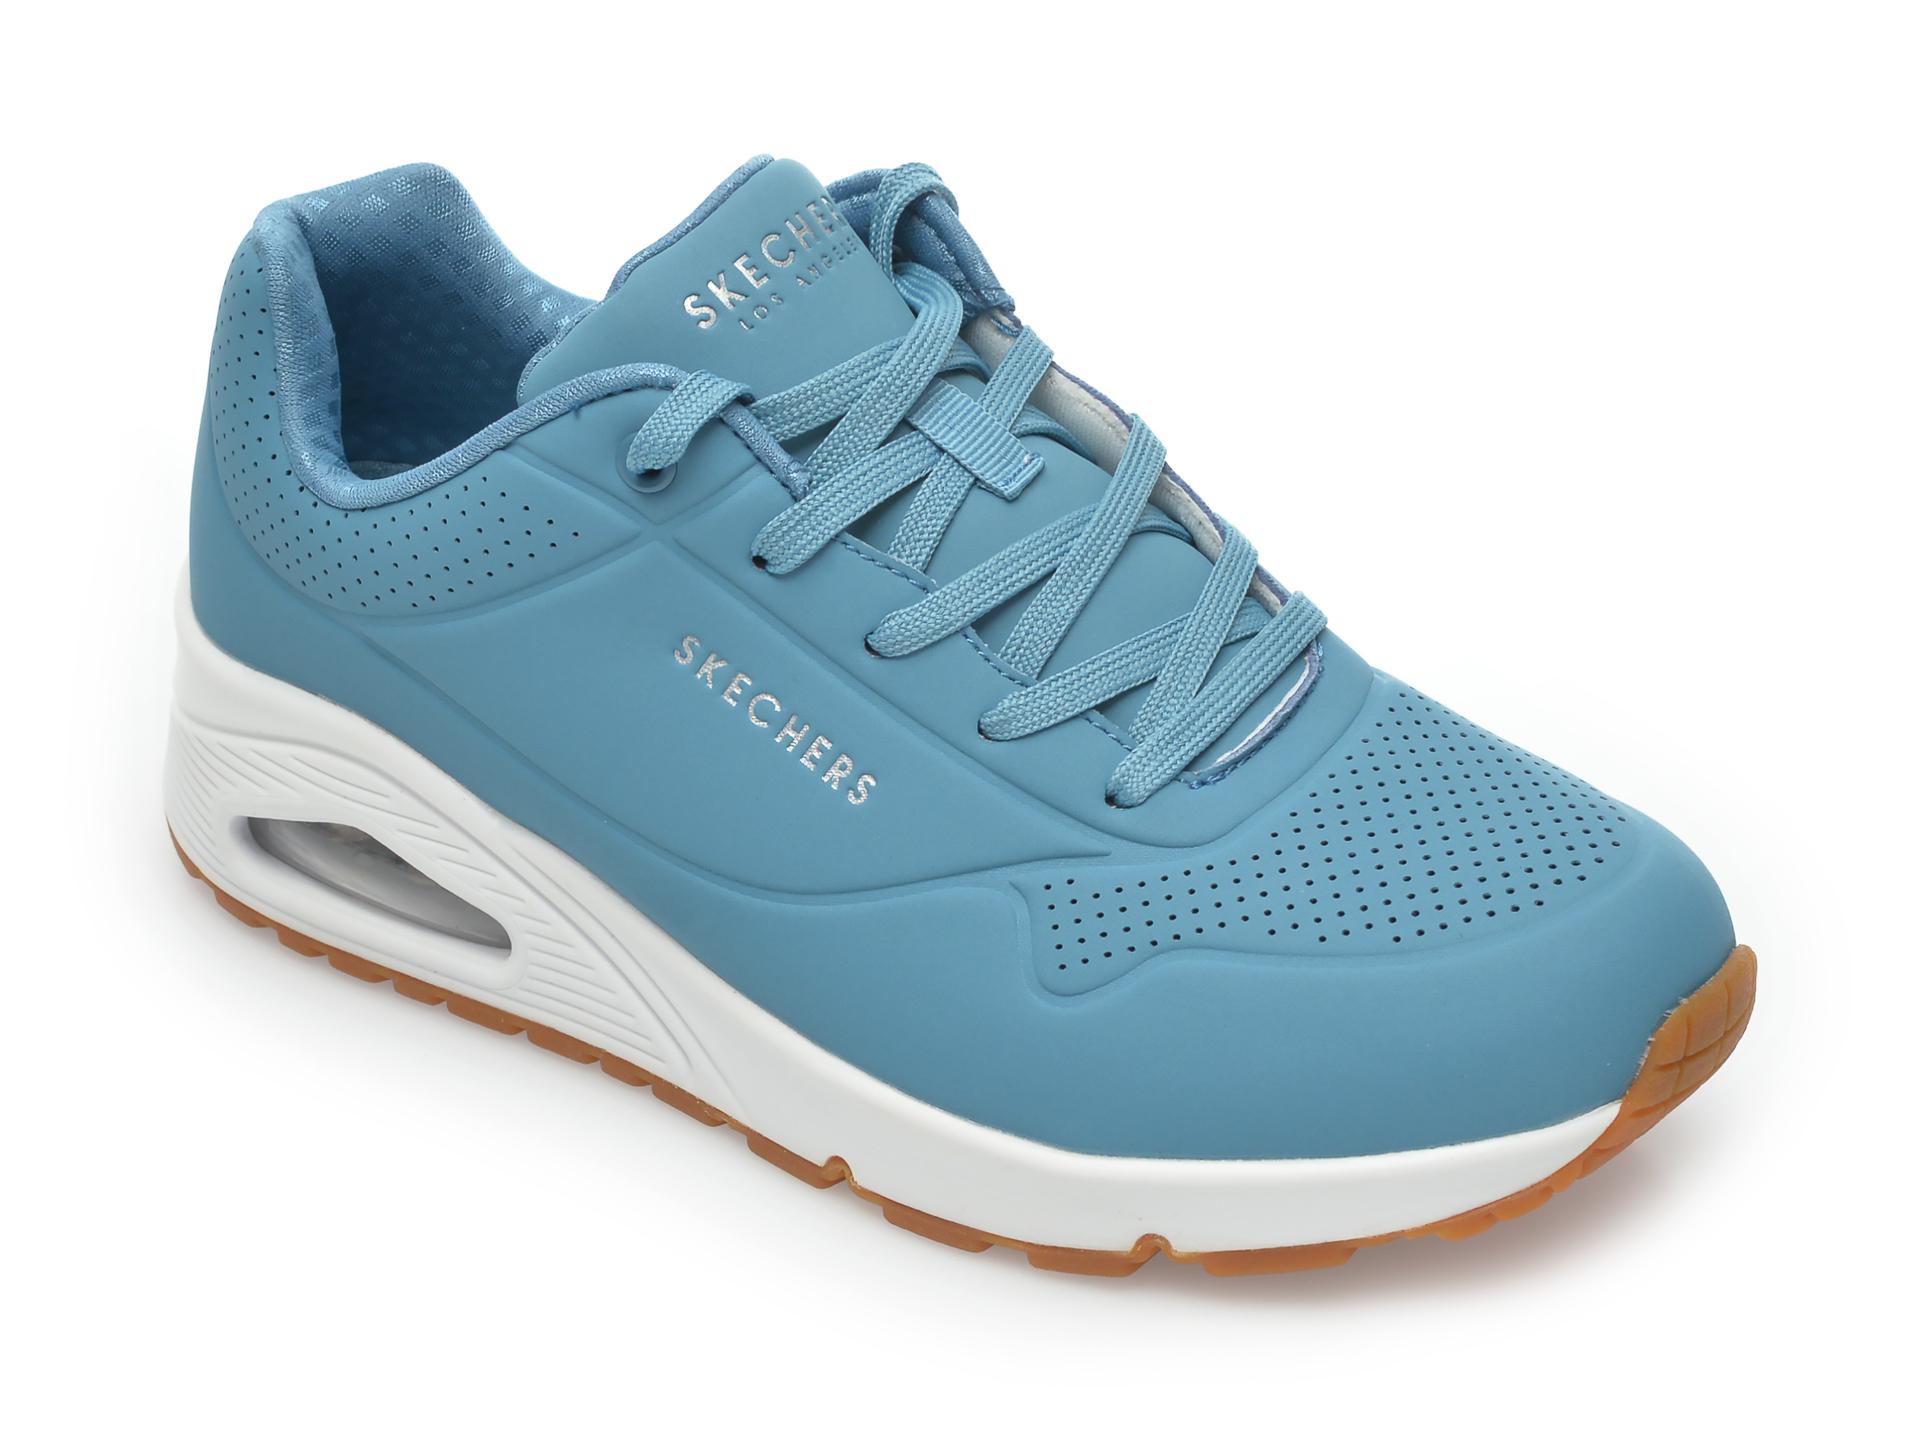 Pantofi sport SKECHERS albastri, Uno Stand On Air, din piele ecologica New